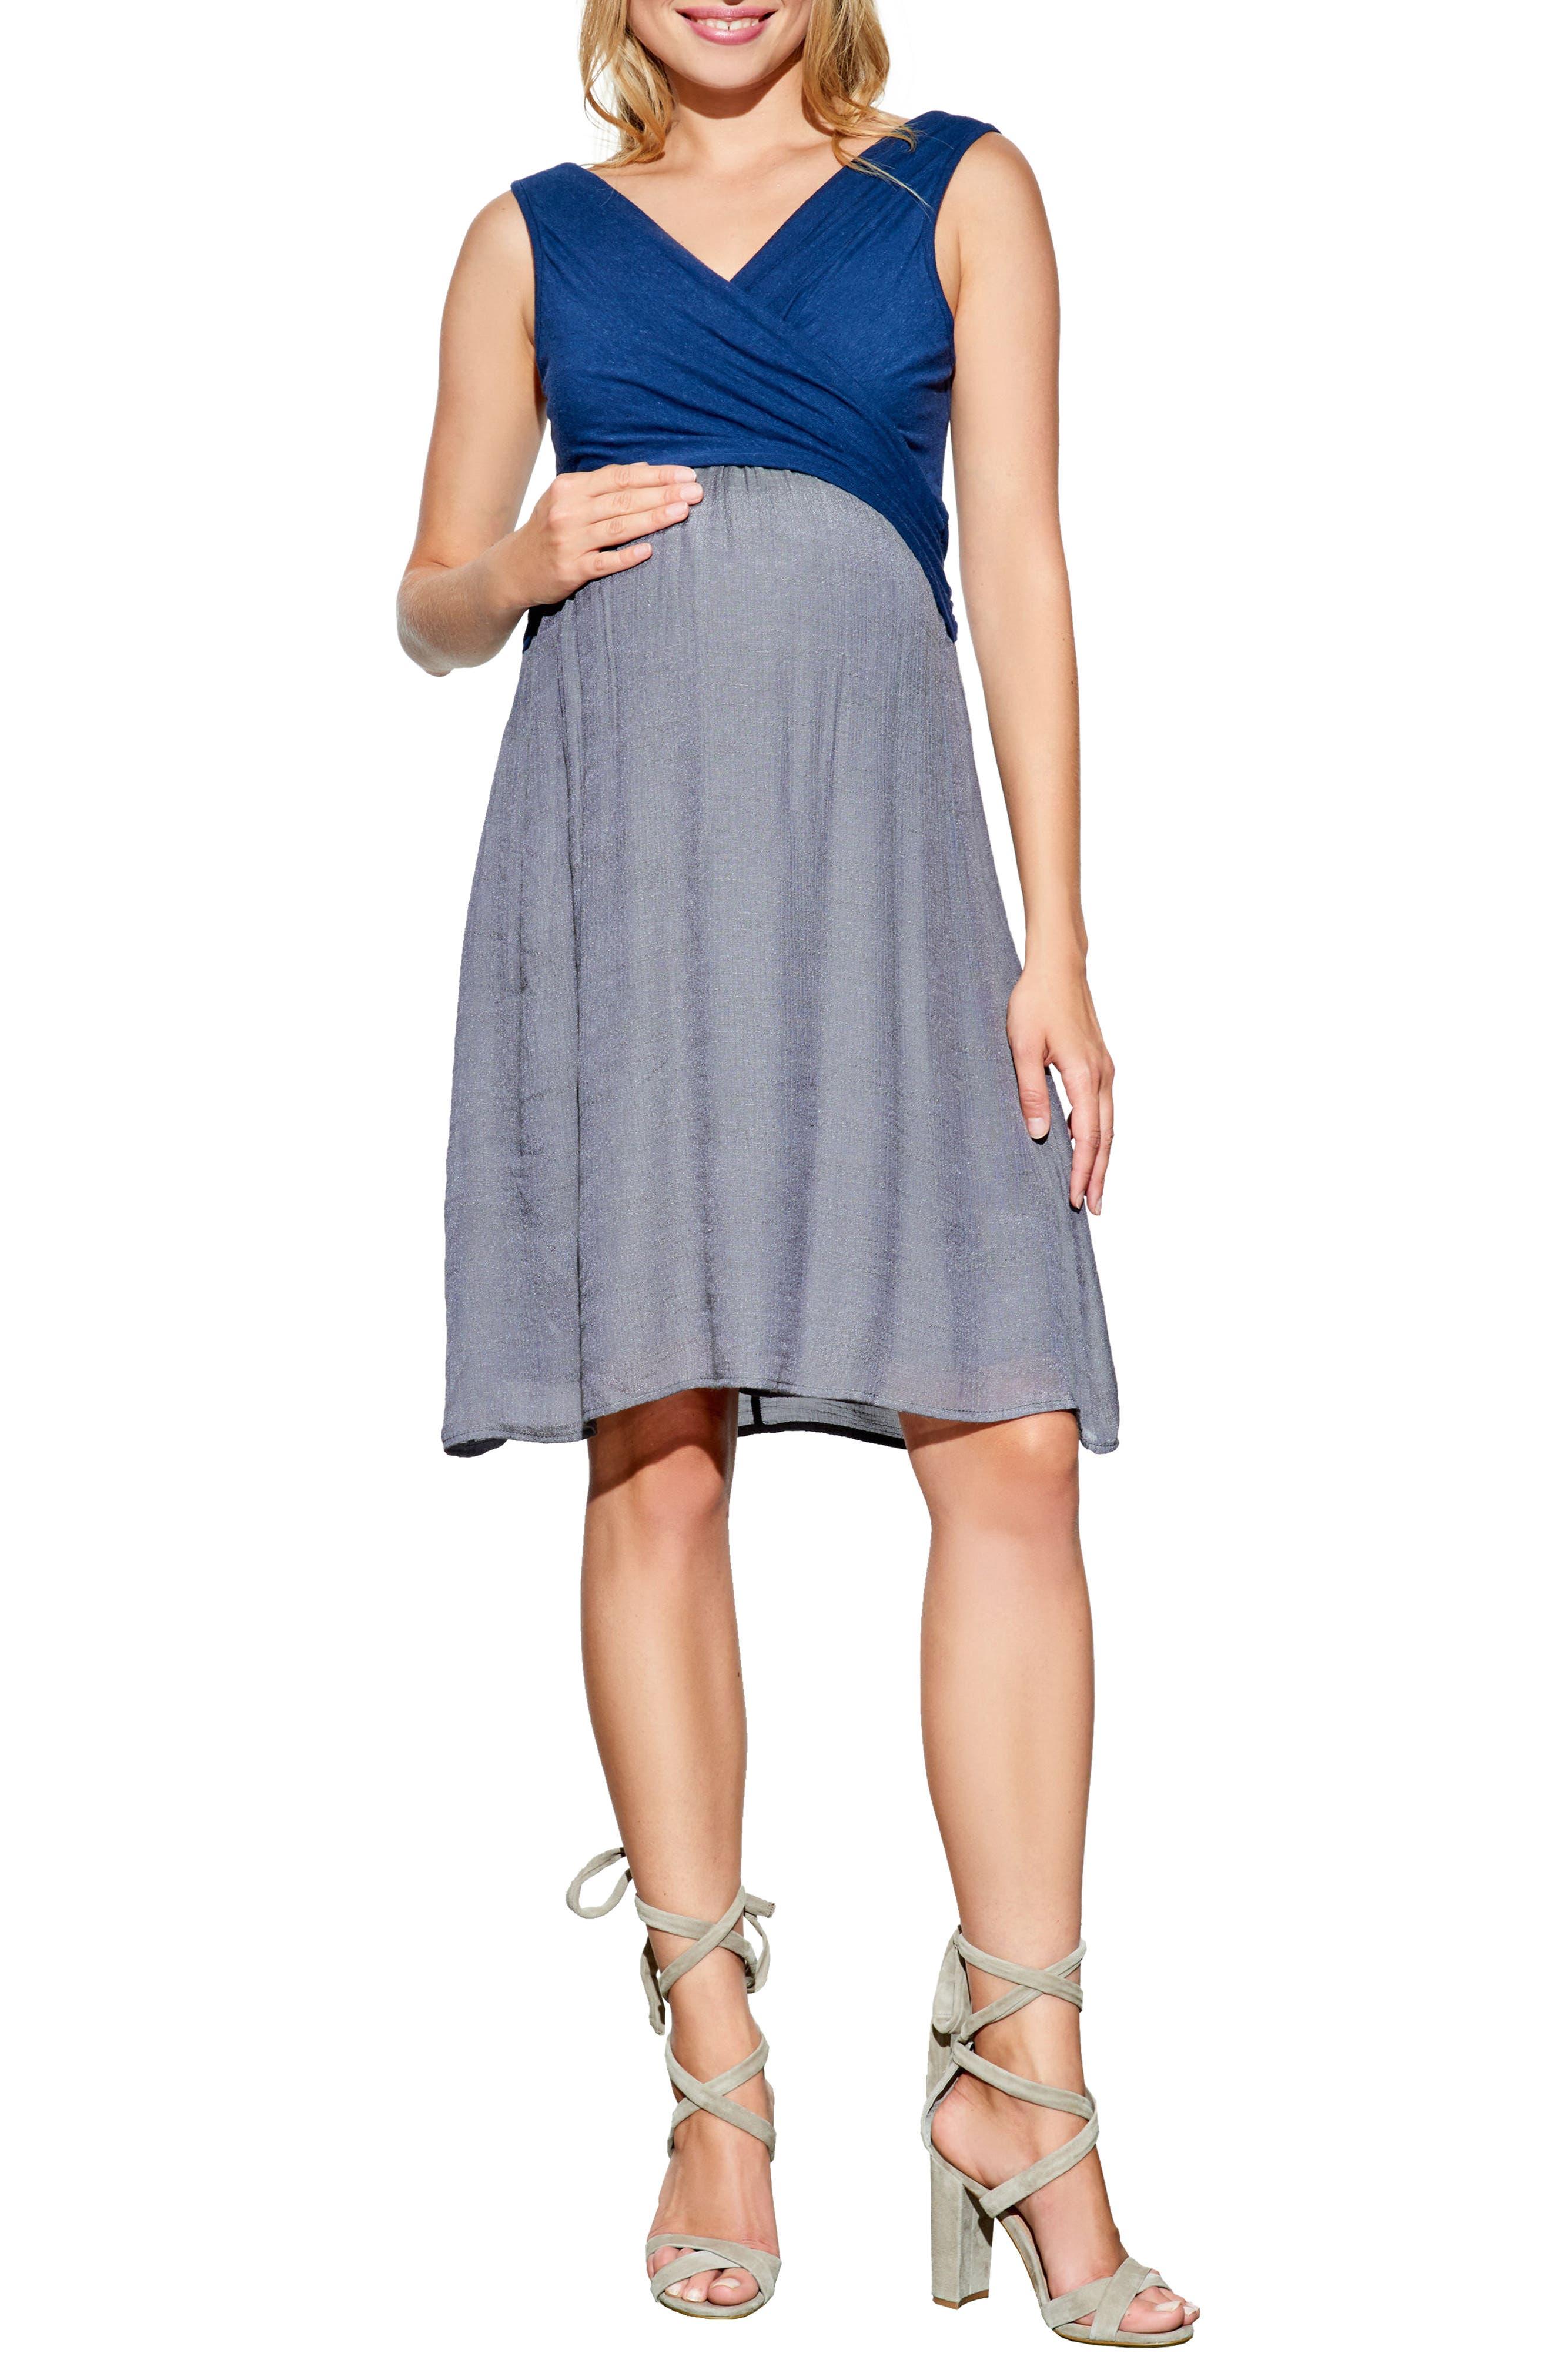 Maternal America Surplice Babydoll Maternity/Nursing Dress